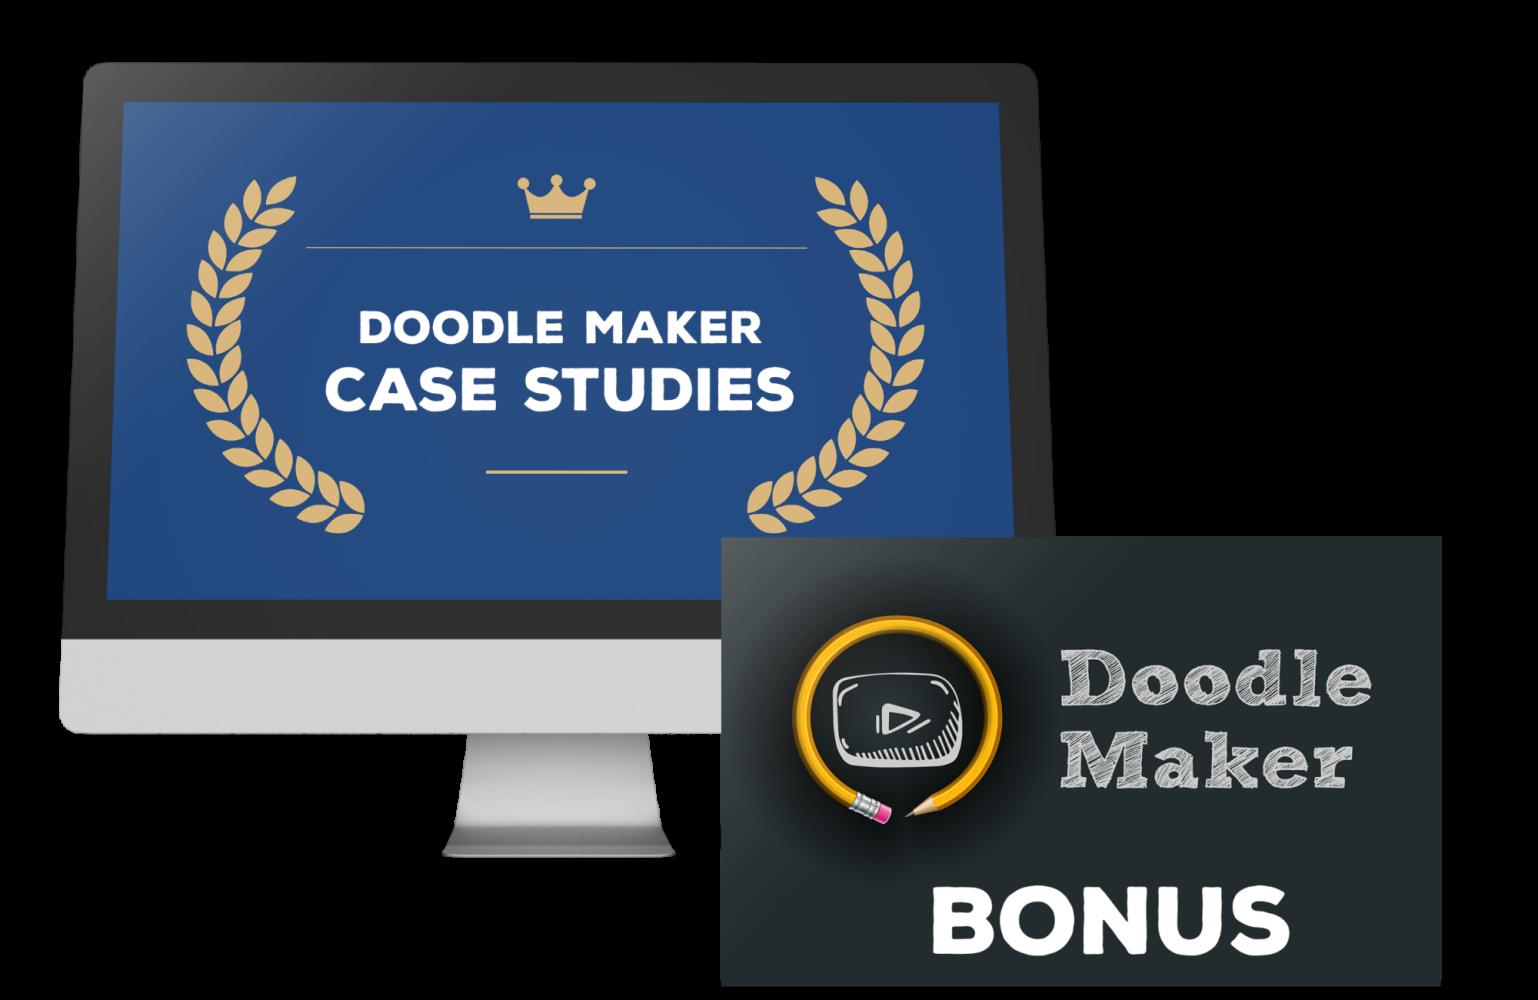 Doodle Maker Bonus 9 - Doodle Maker Video Case Studies